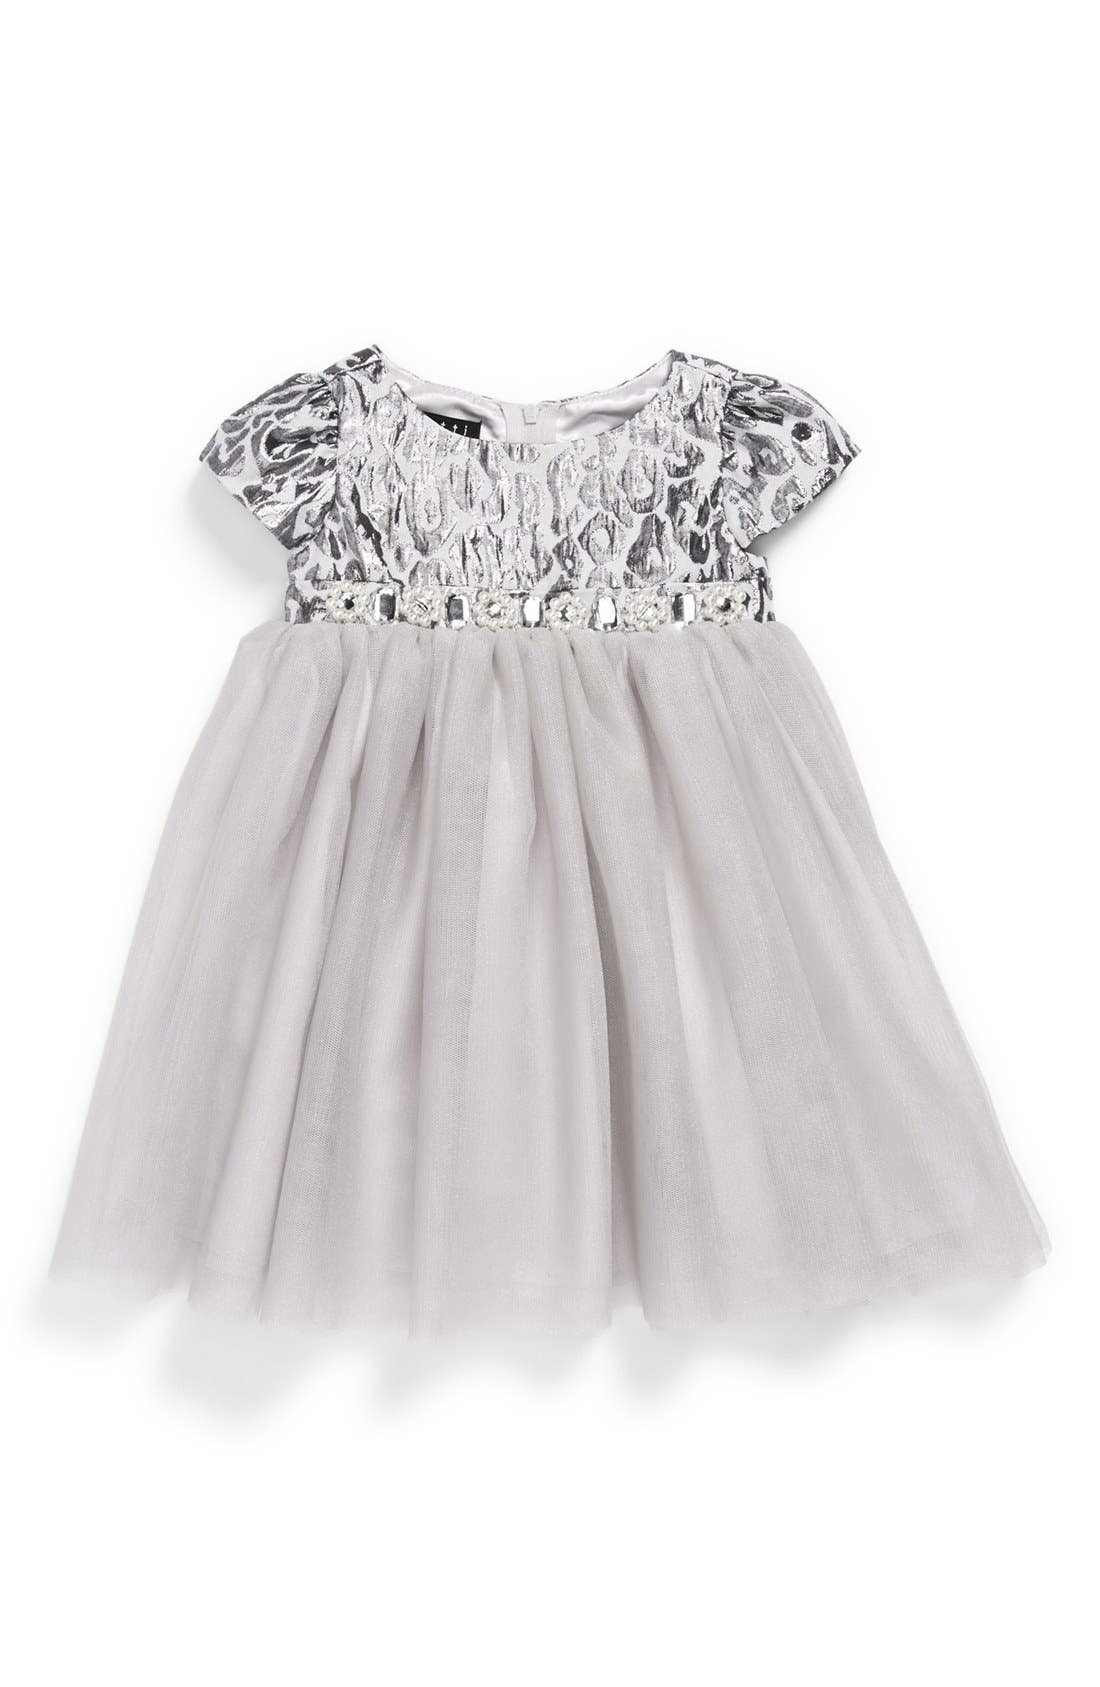 Main Image - Biscotti Leopard Print Ballerina Dress (Baby Girls)